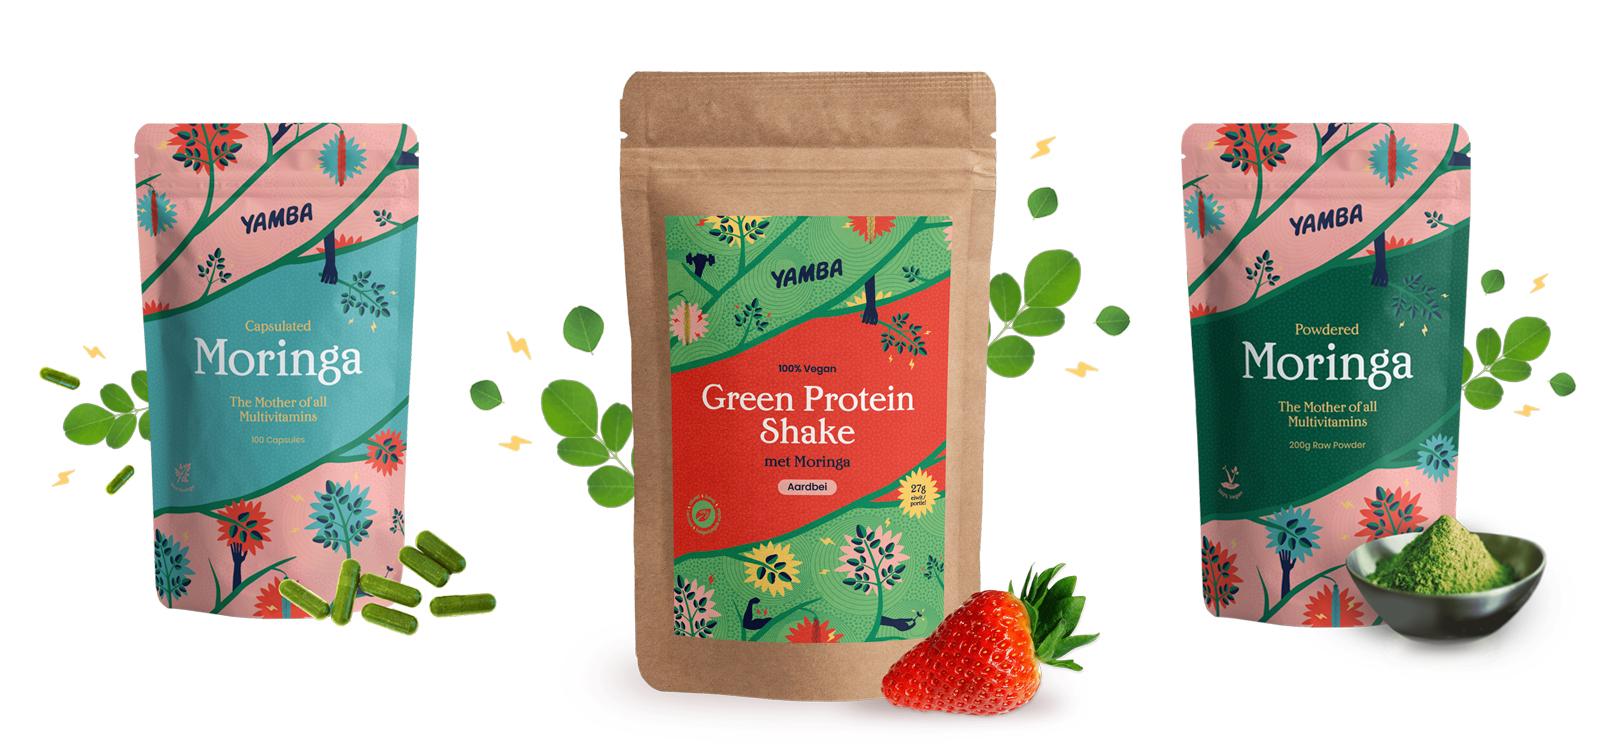 Yamba-Moringa-Protein-Shake